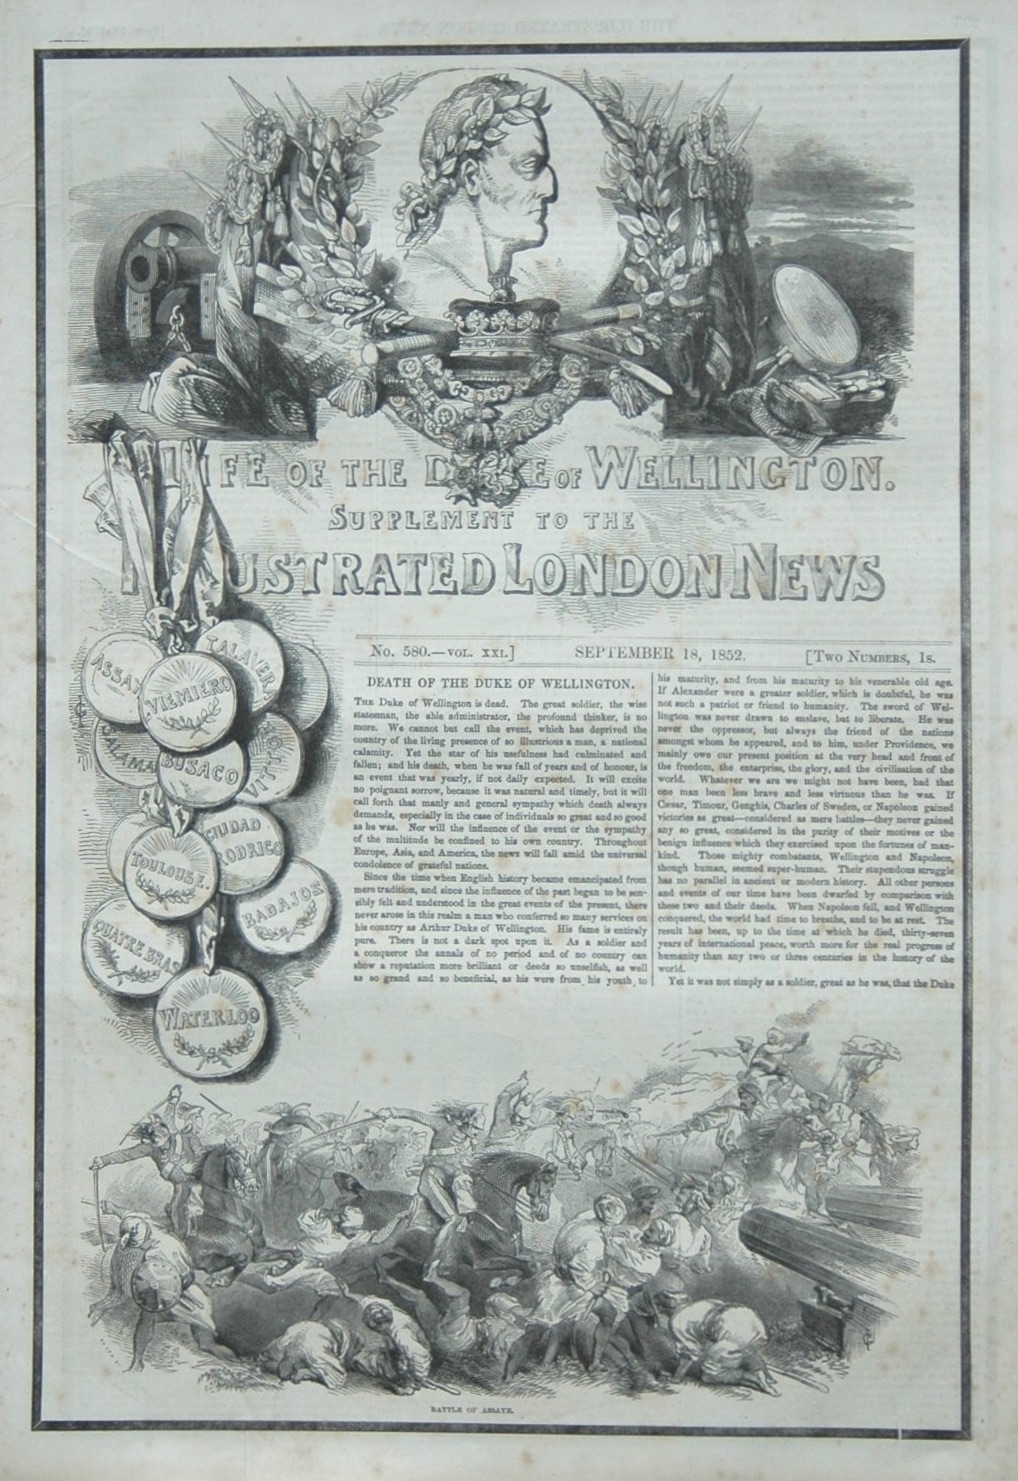 Life of The Duke of Wellington. (Supplement)